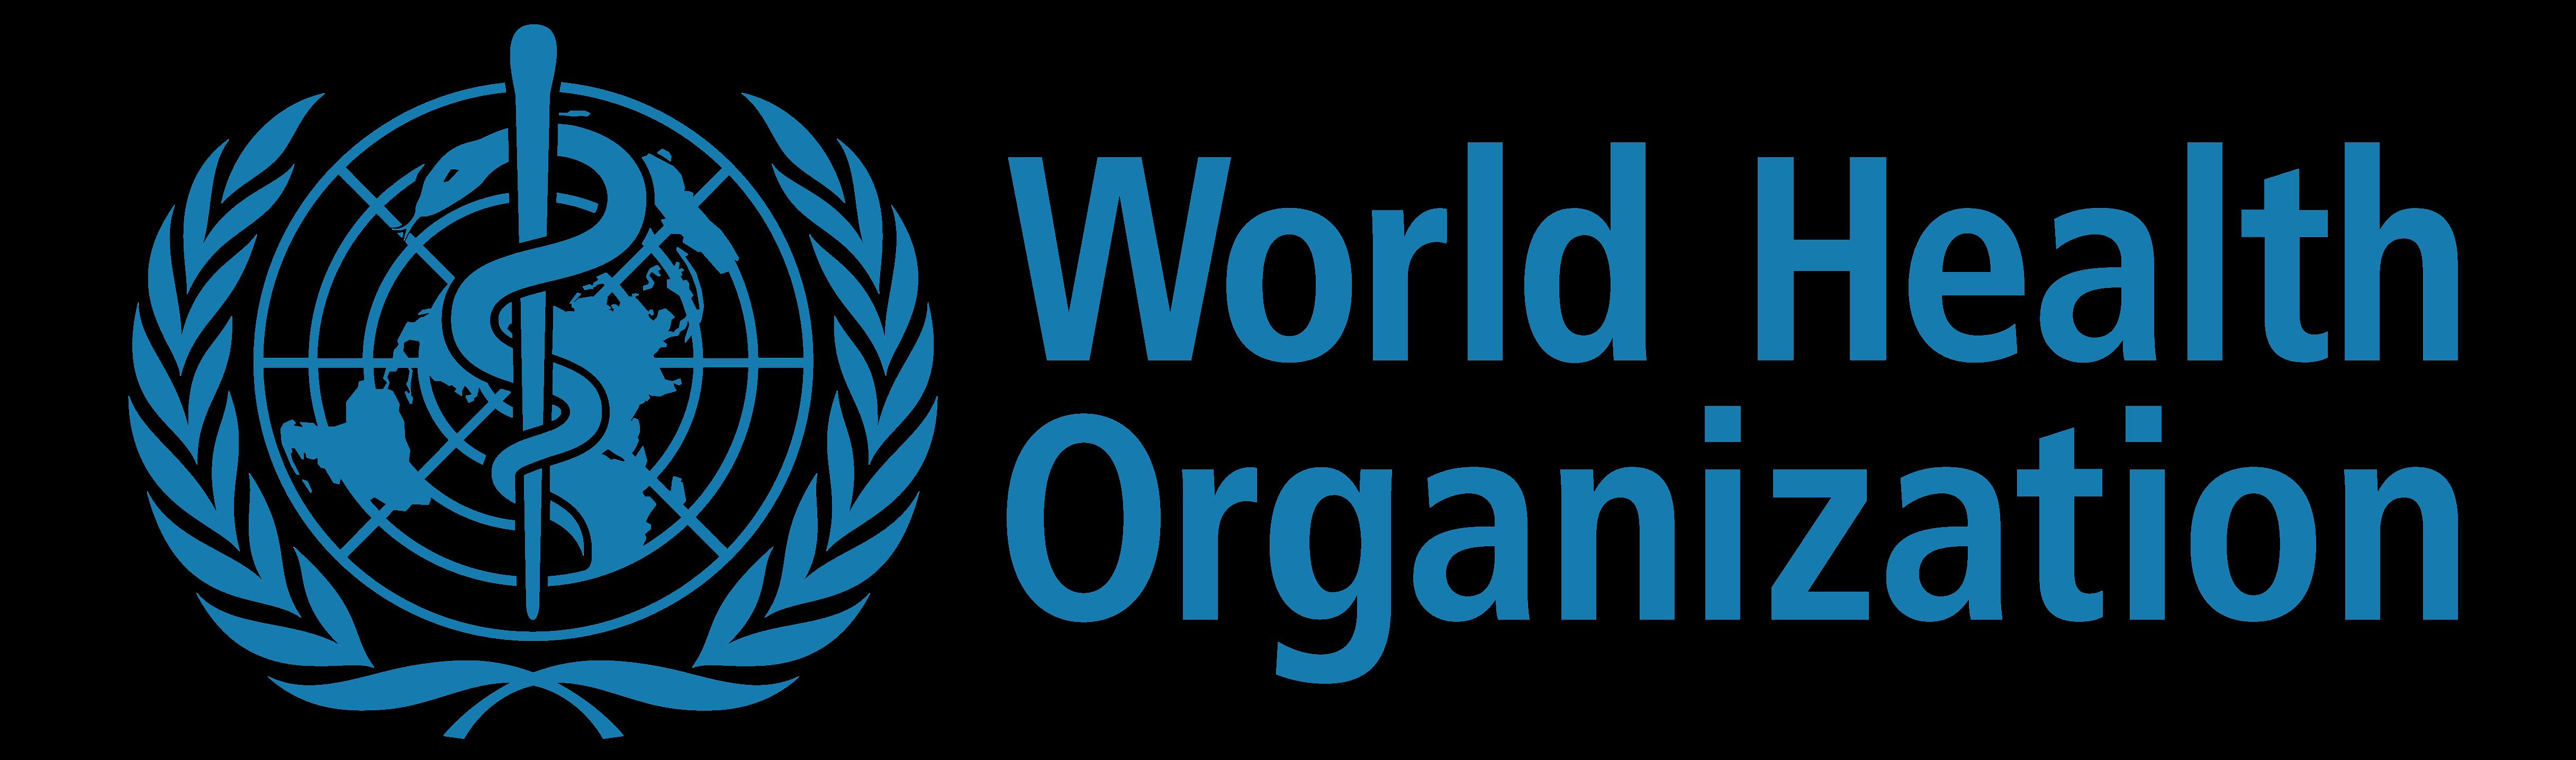 world_health_organization (1)